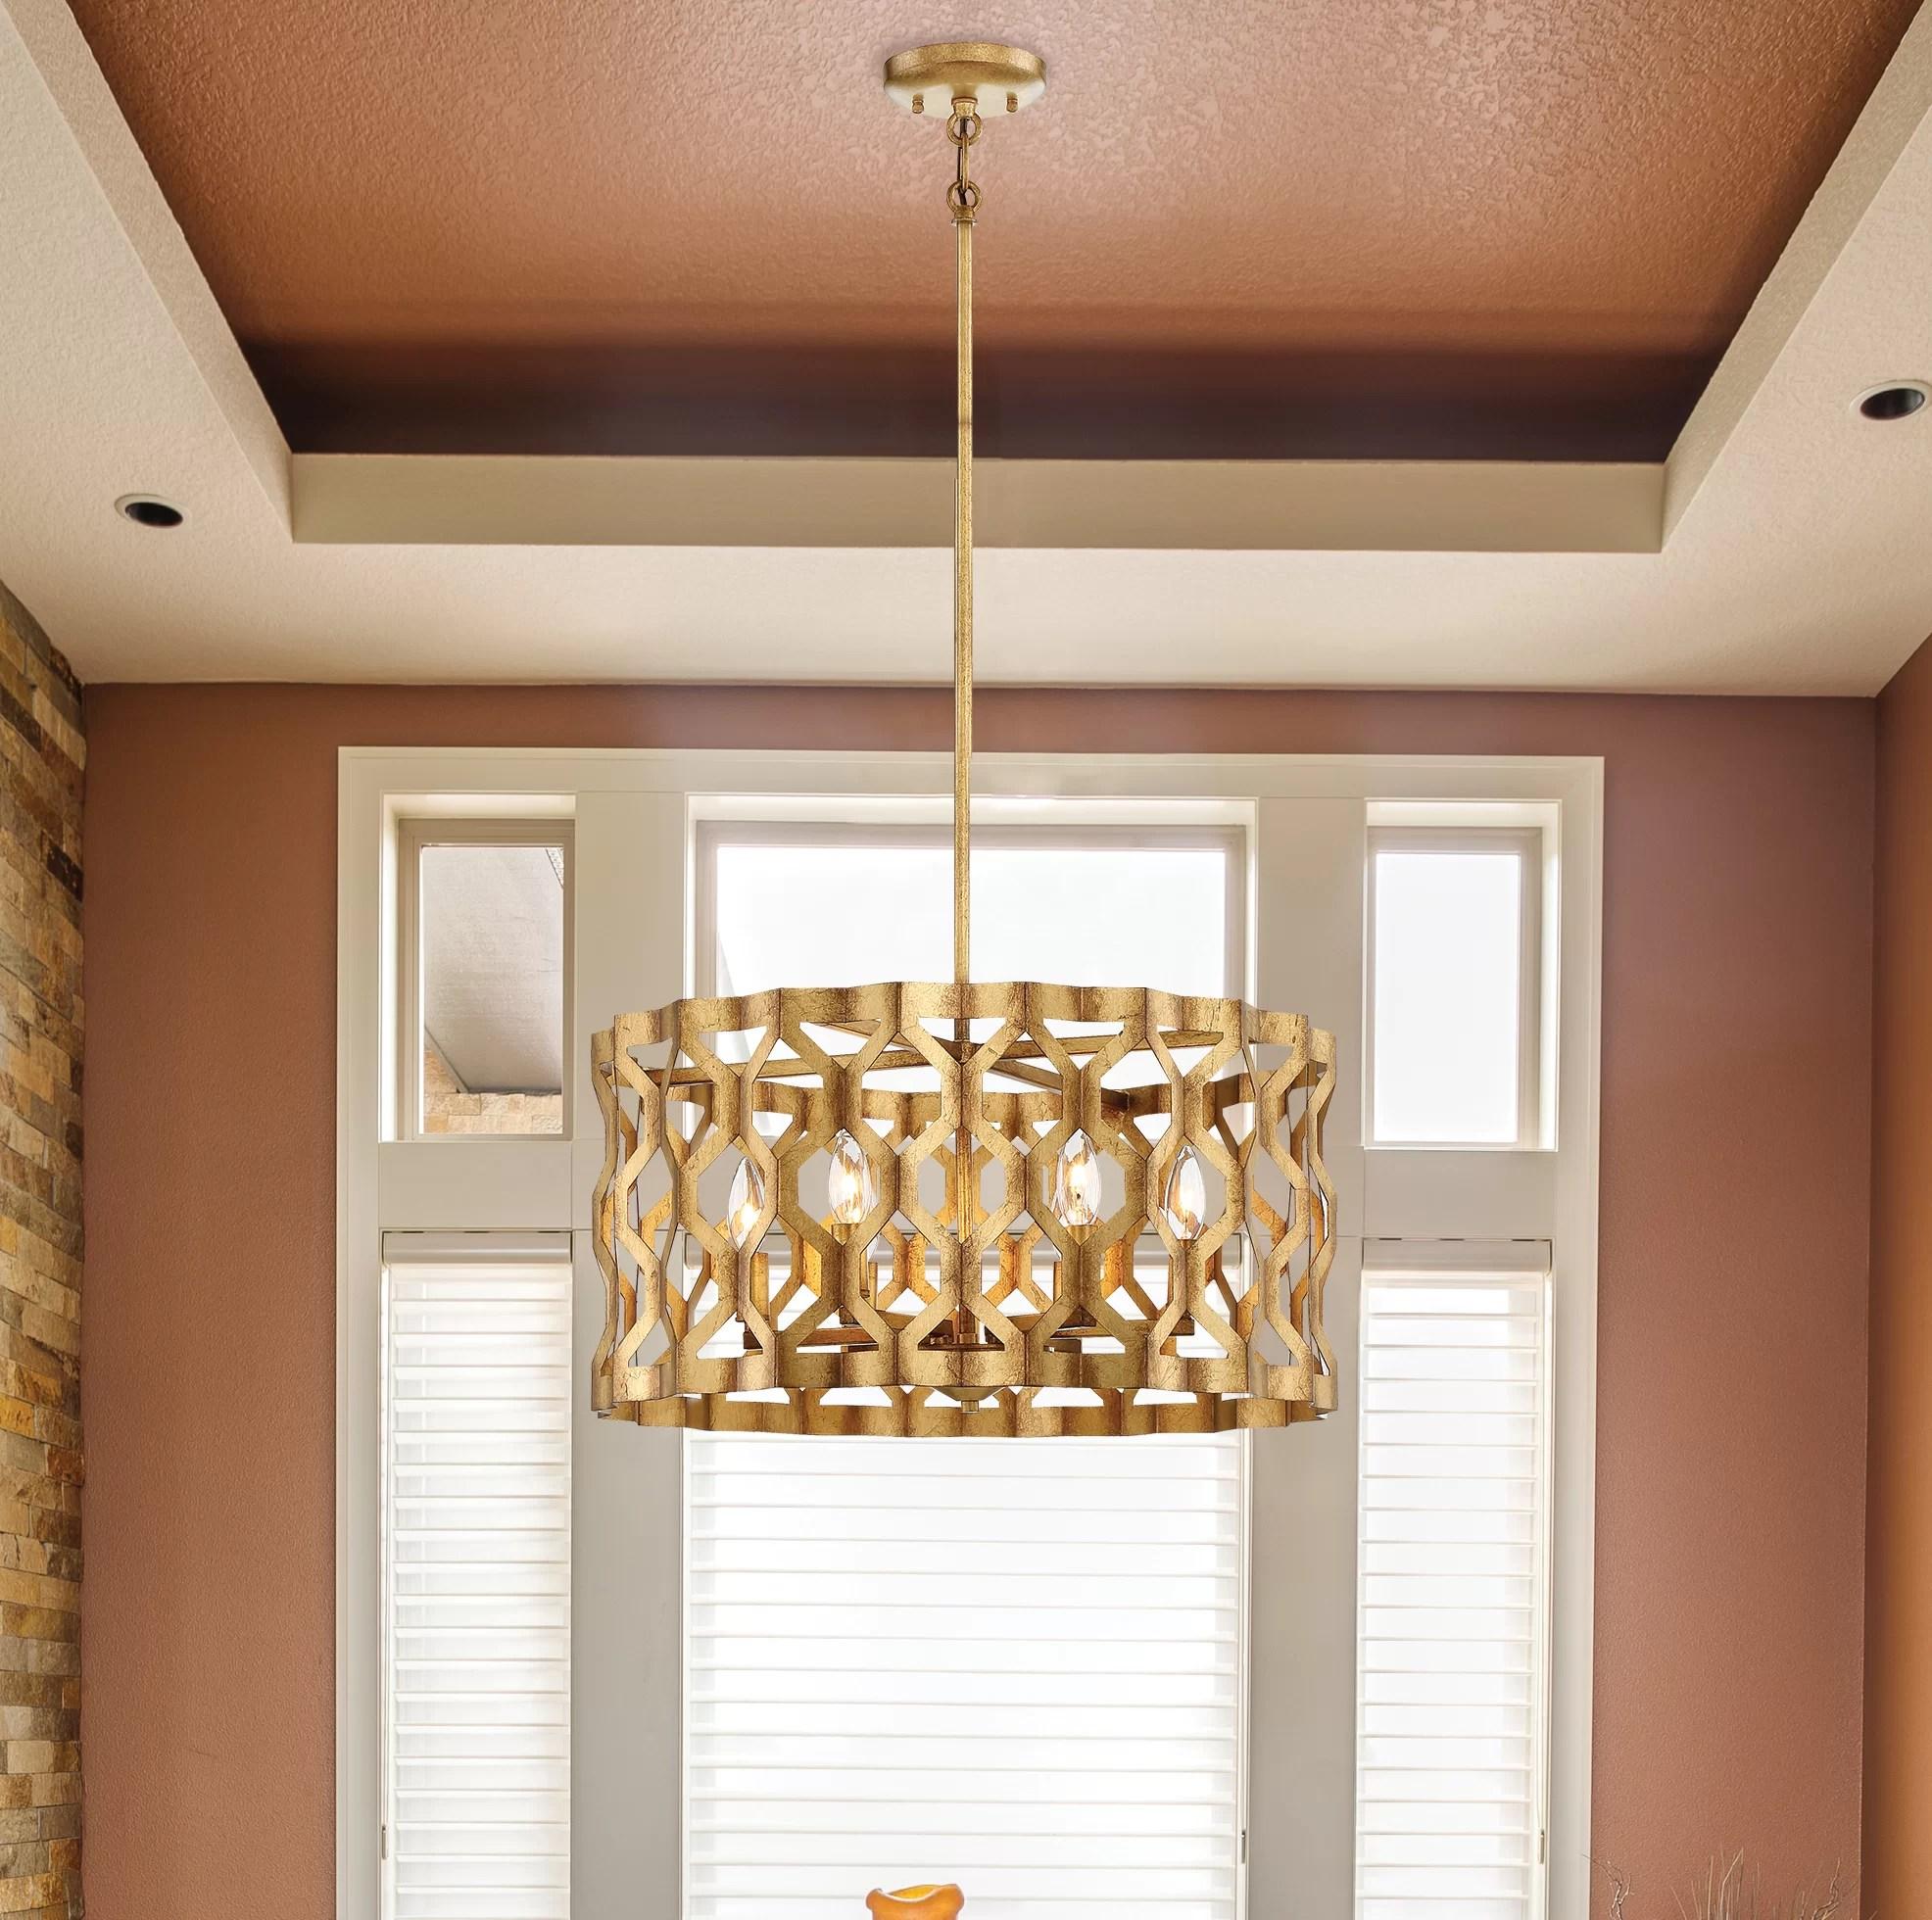 https www wayfair com lighting pdp metropolitan by minka coronade 5 light unique statement drum chandelier mbm2387 html